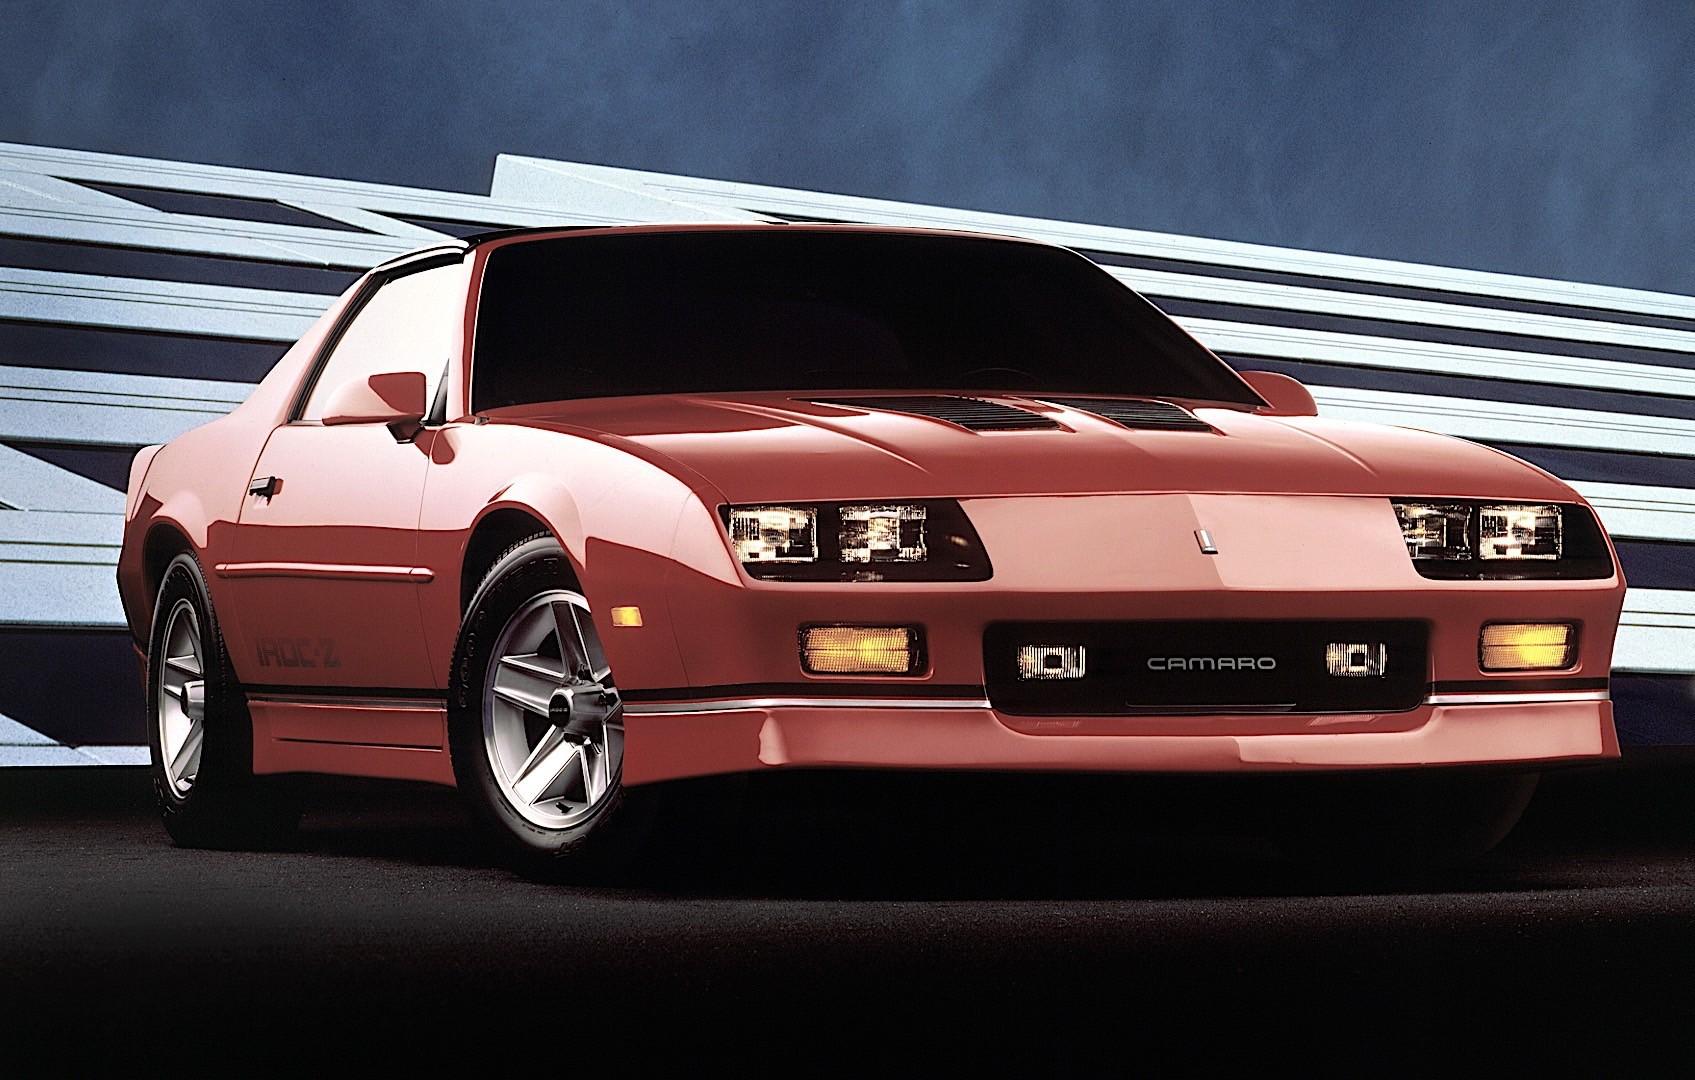 camaro chevrolet 1982 1992 autoevolution 1988 1989 1990 1985 1983 1984 1986 1987 1991 specs